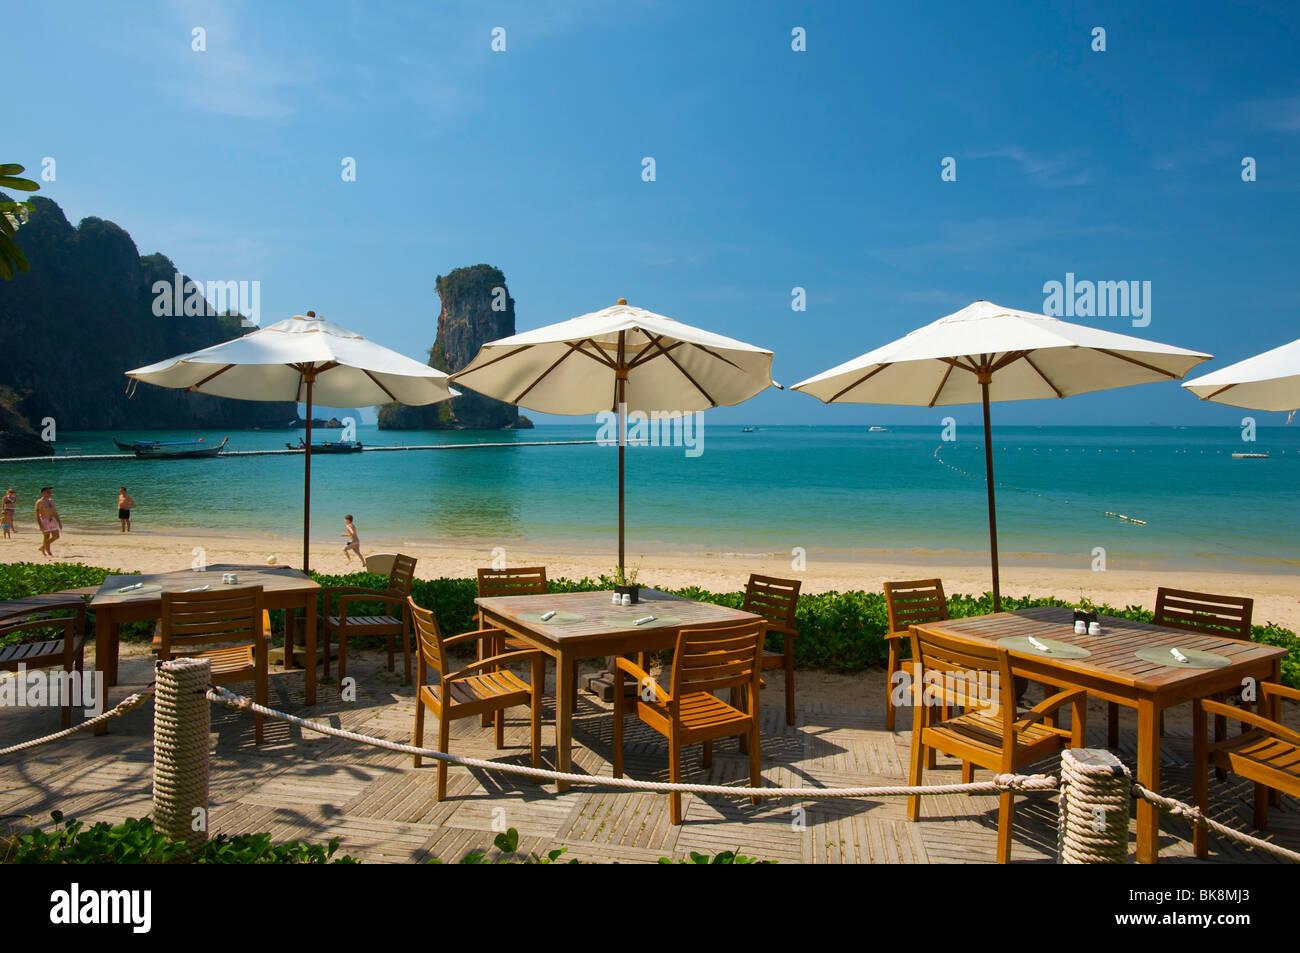 Centara Resort, Krabi, Thailand, Asia - Stock Image